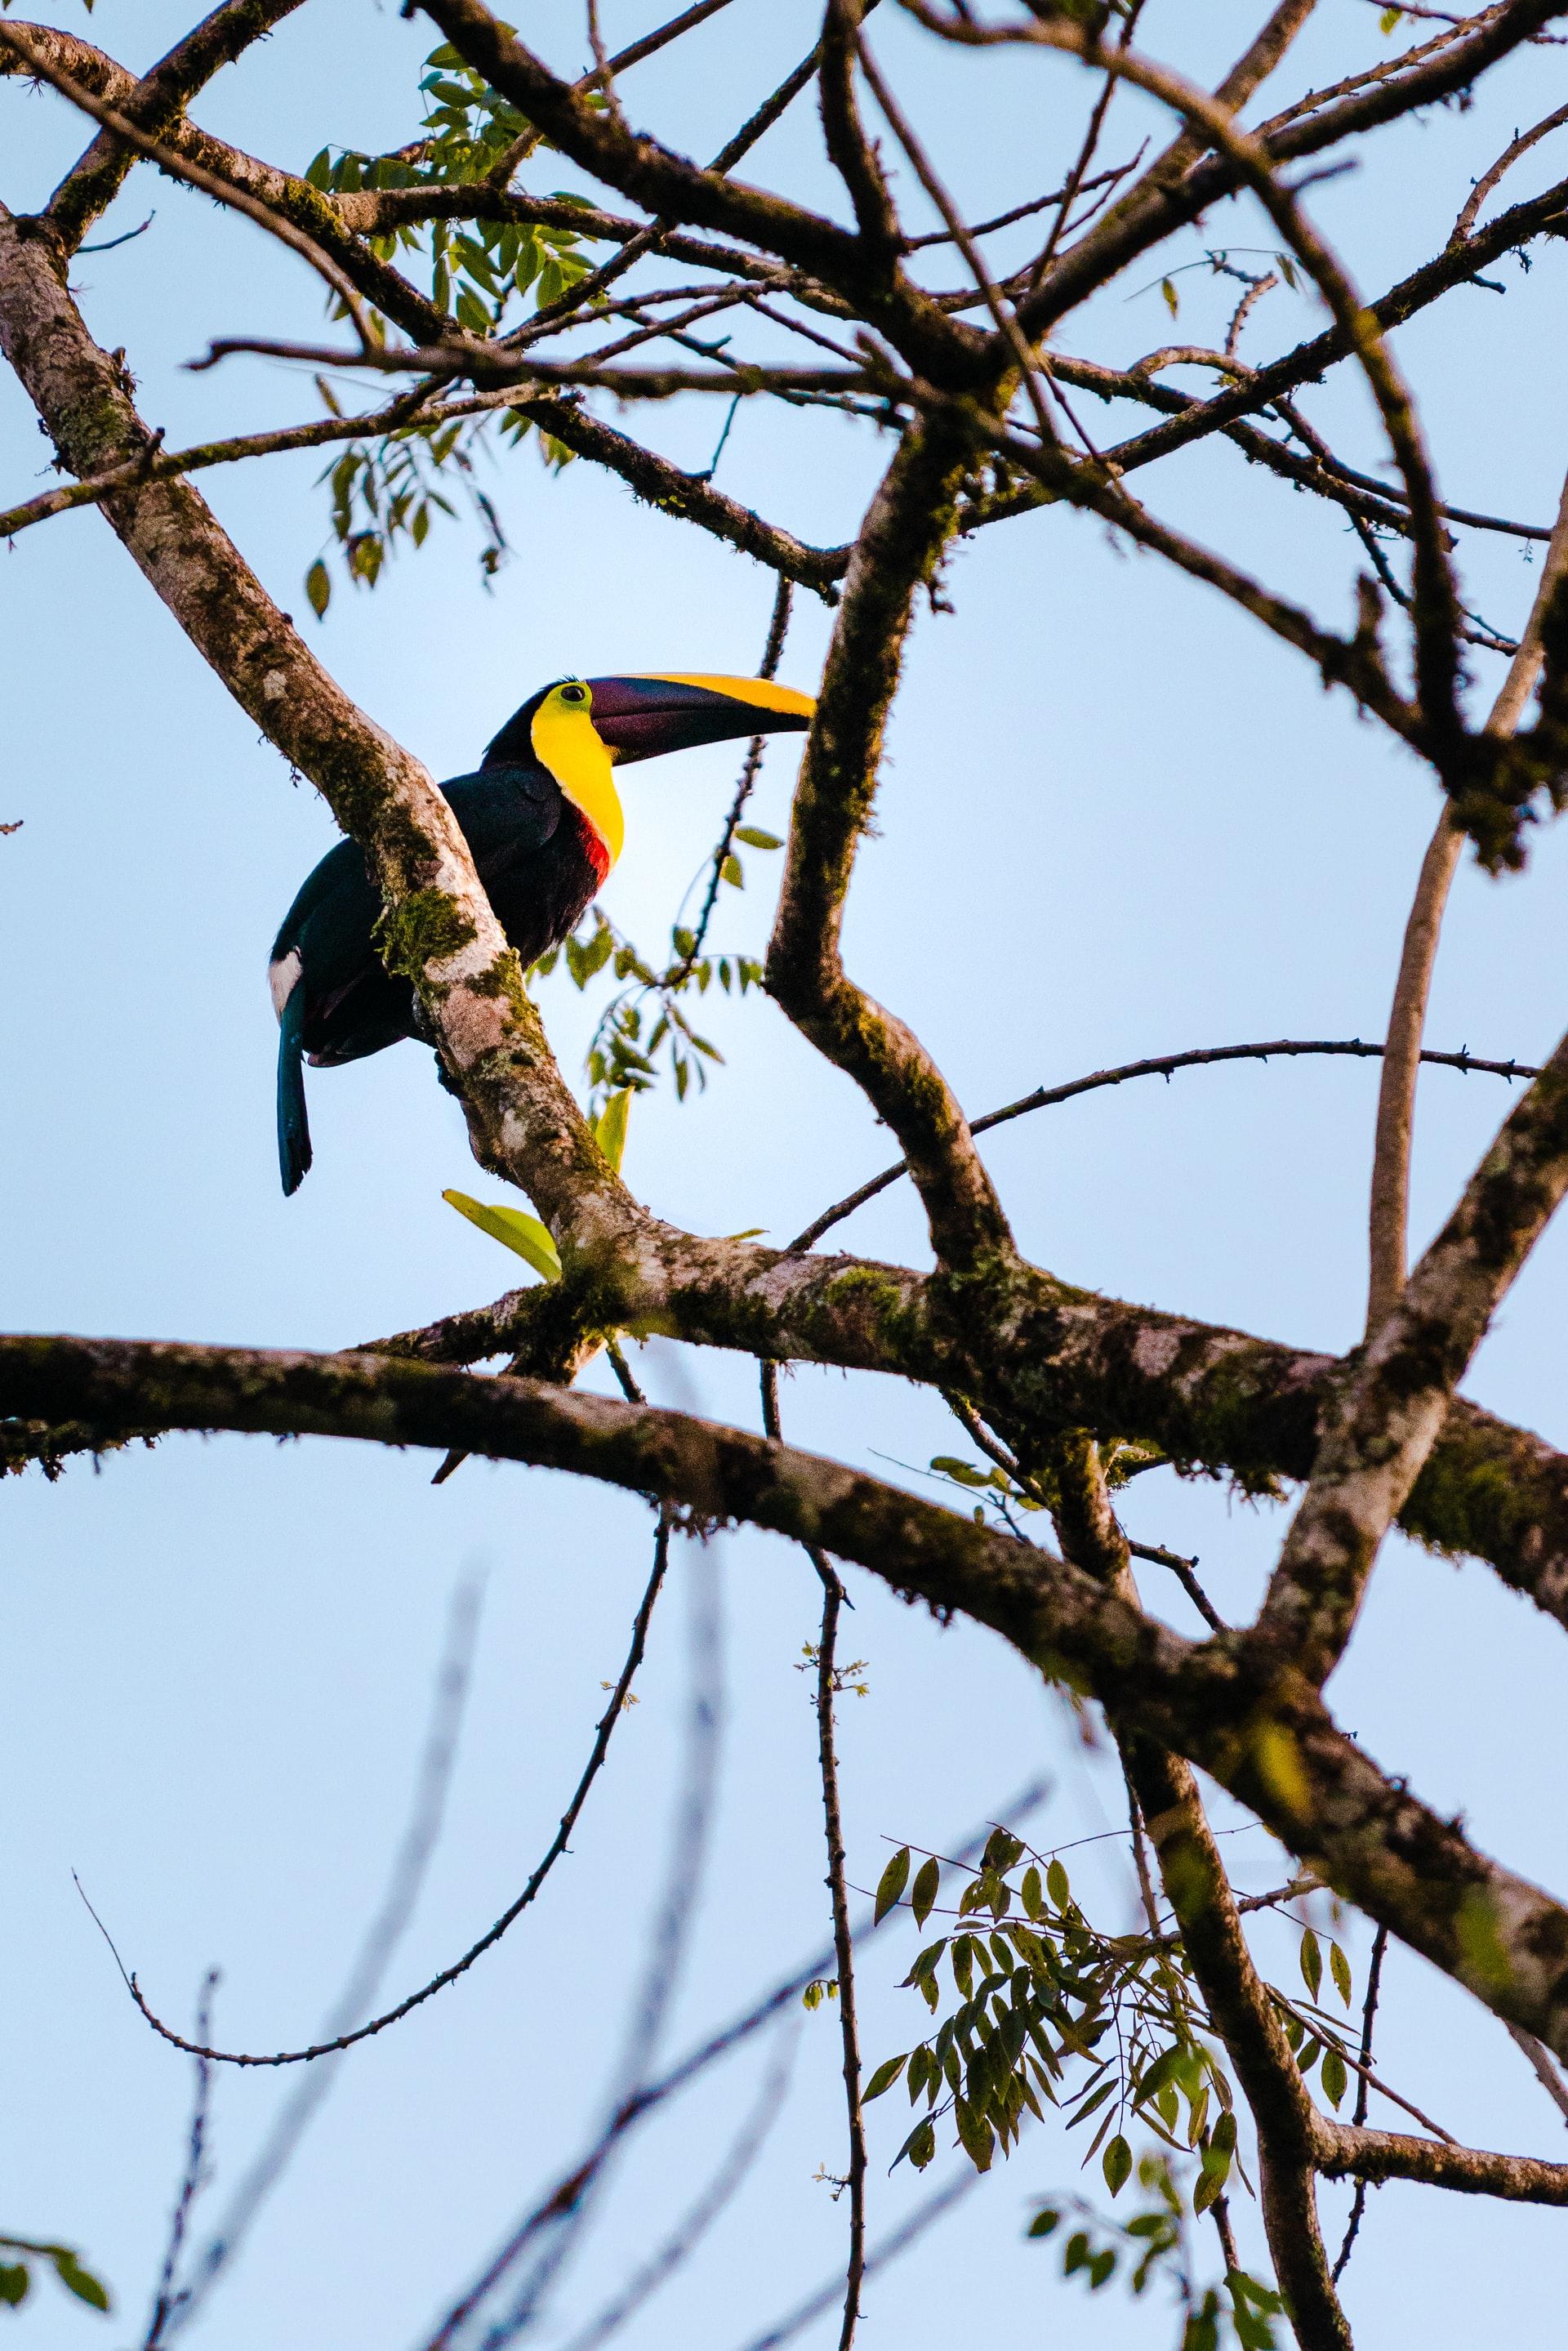 Toucan in a tree in costa rica